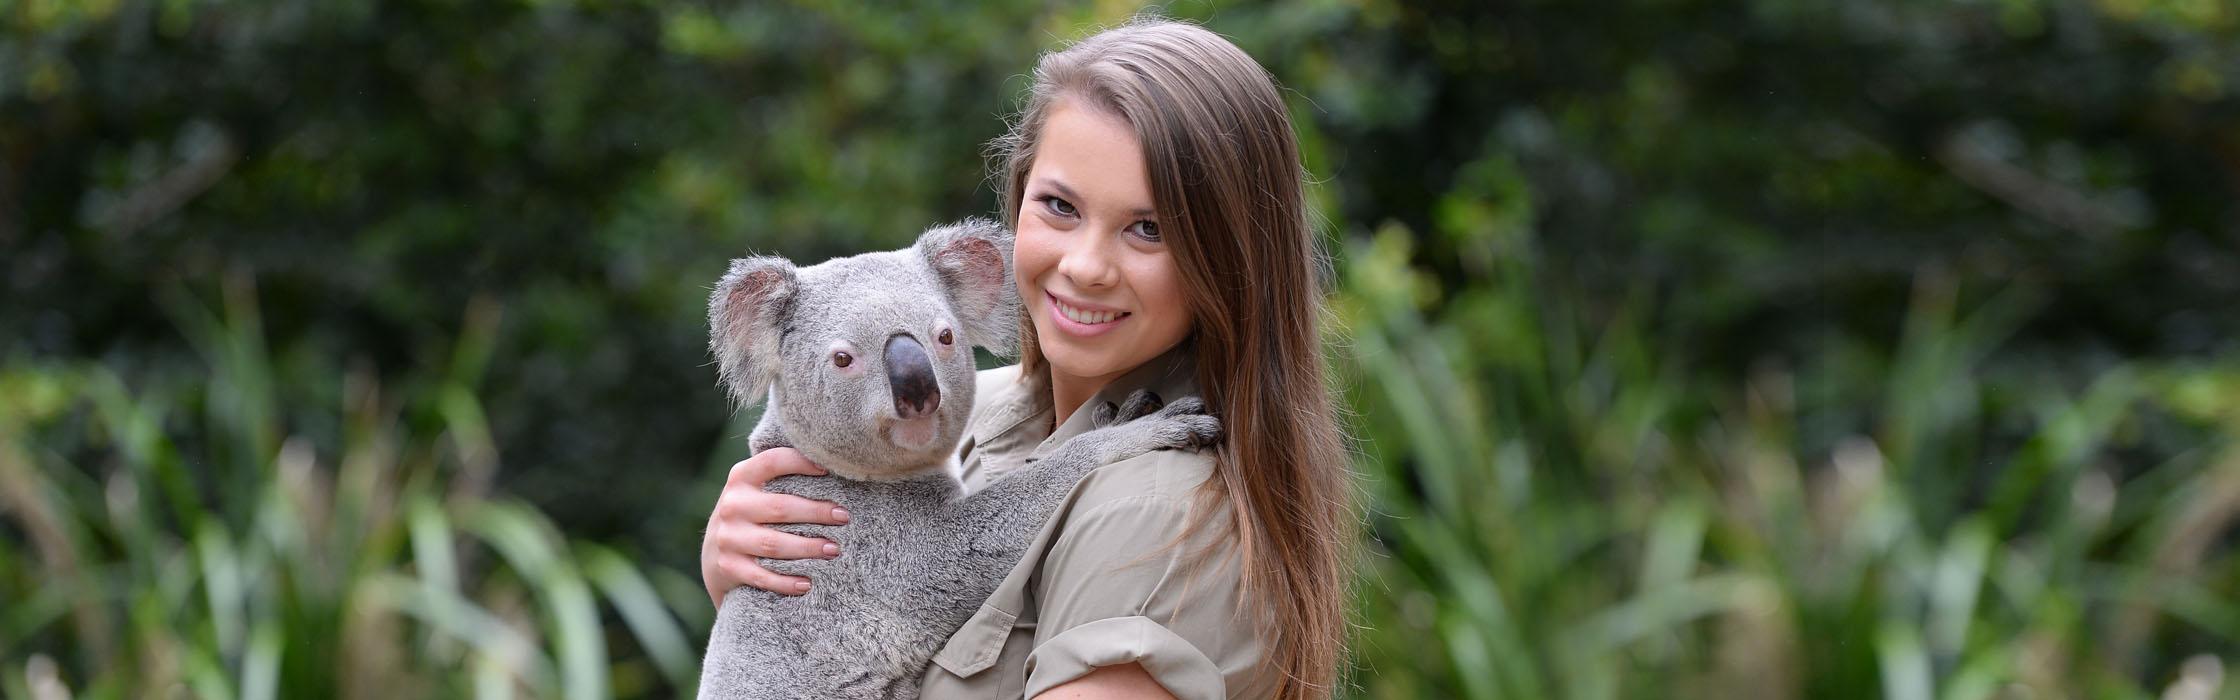 Experiences-Animal Encounters-Pat a Koala Encounter2240x700